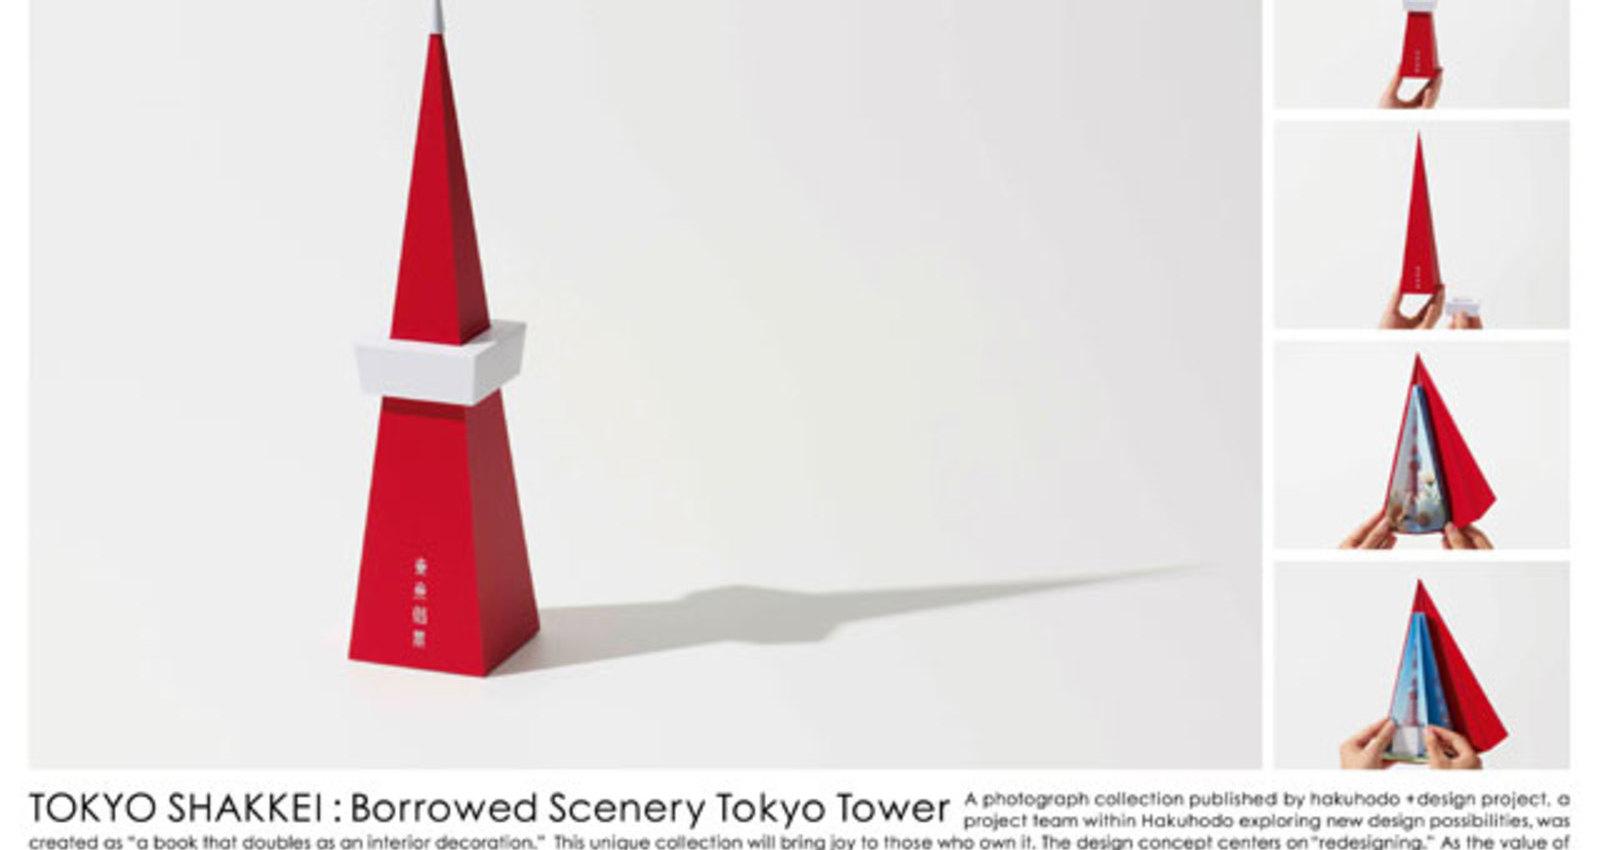 TOKYO SHAKKEI